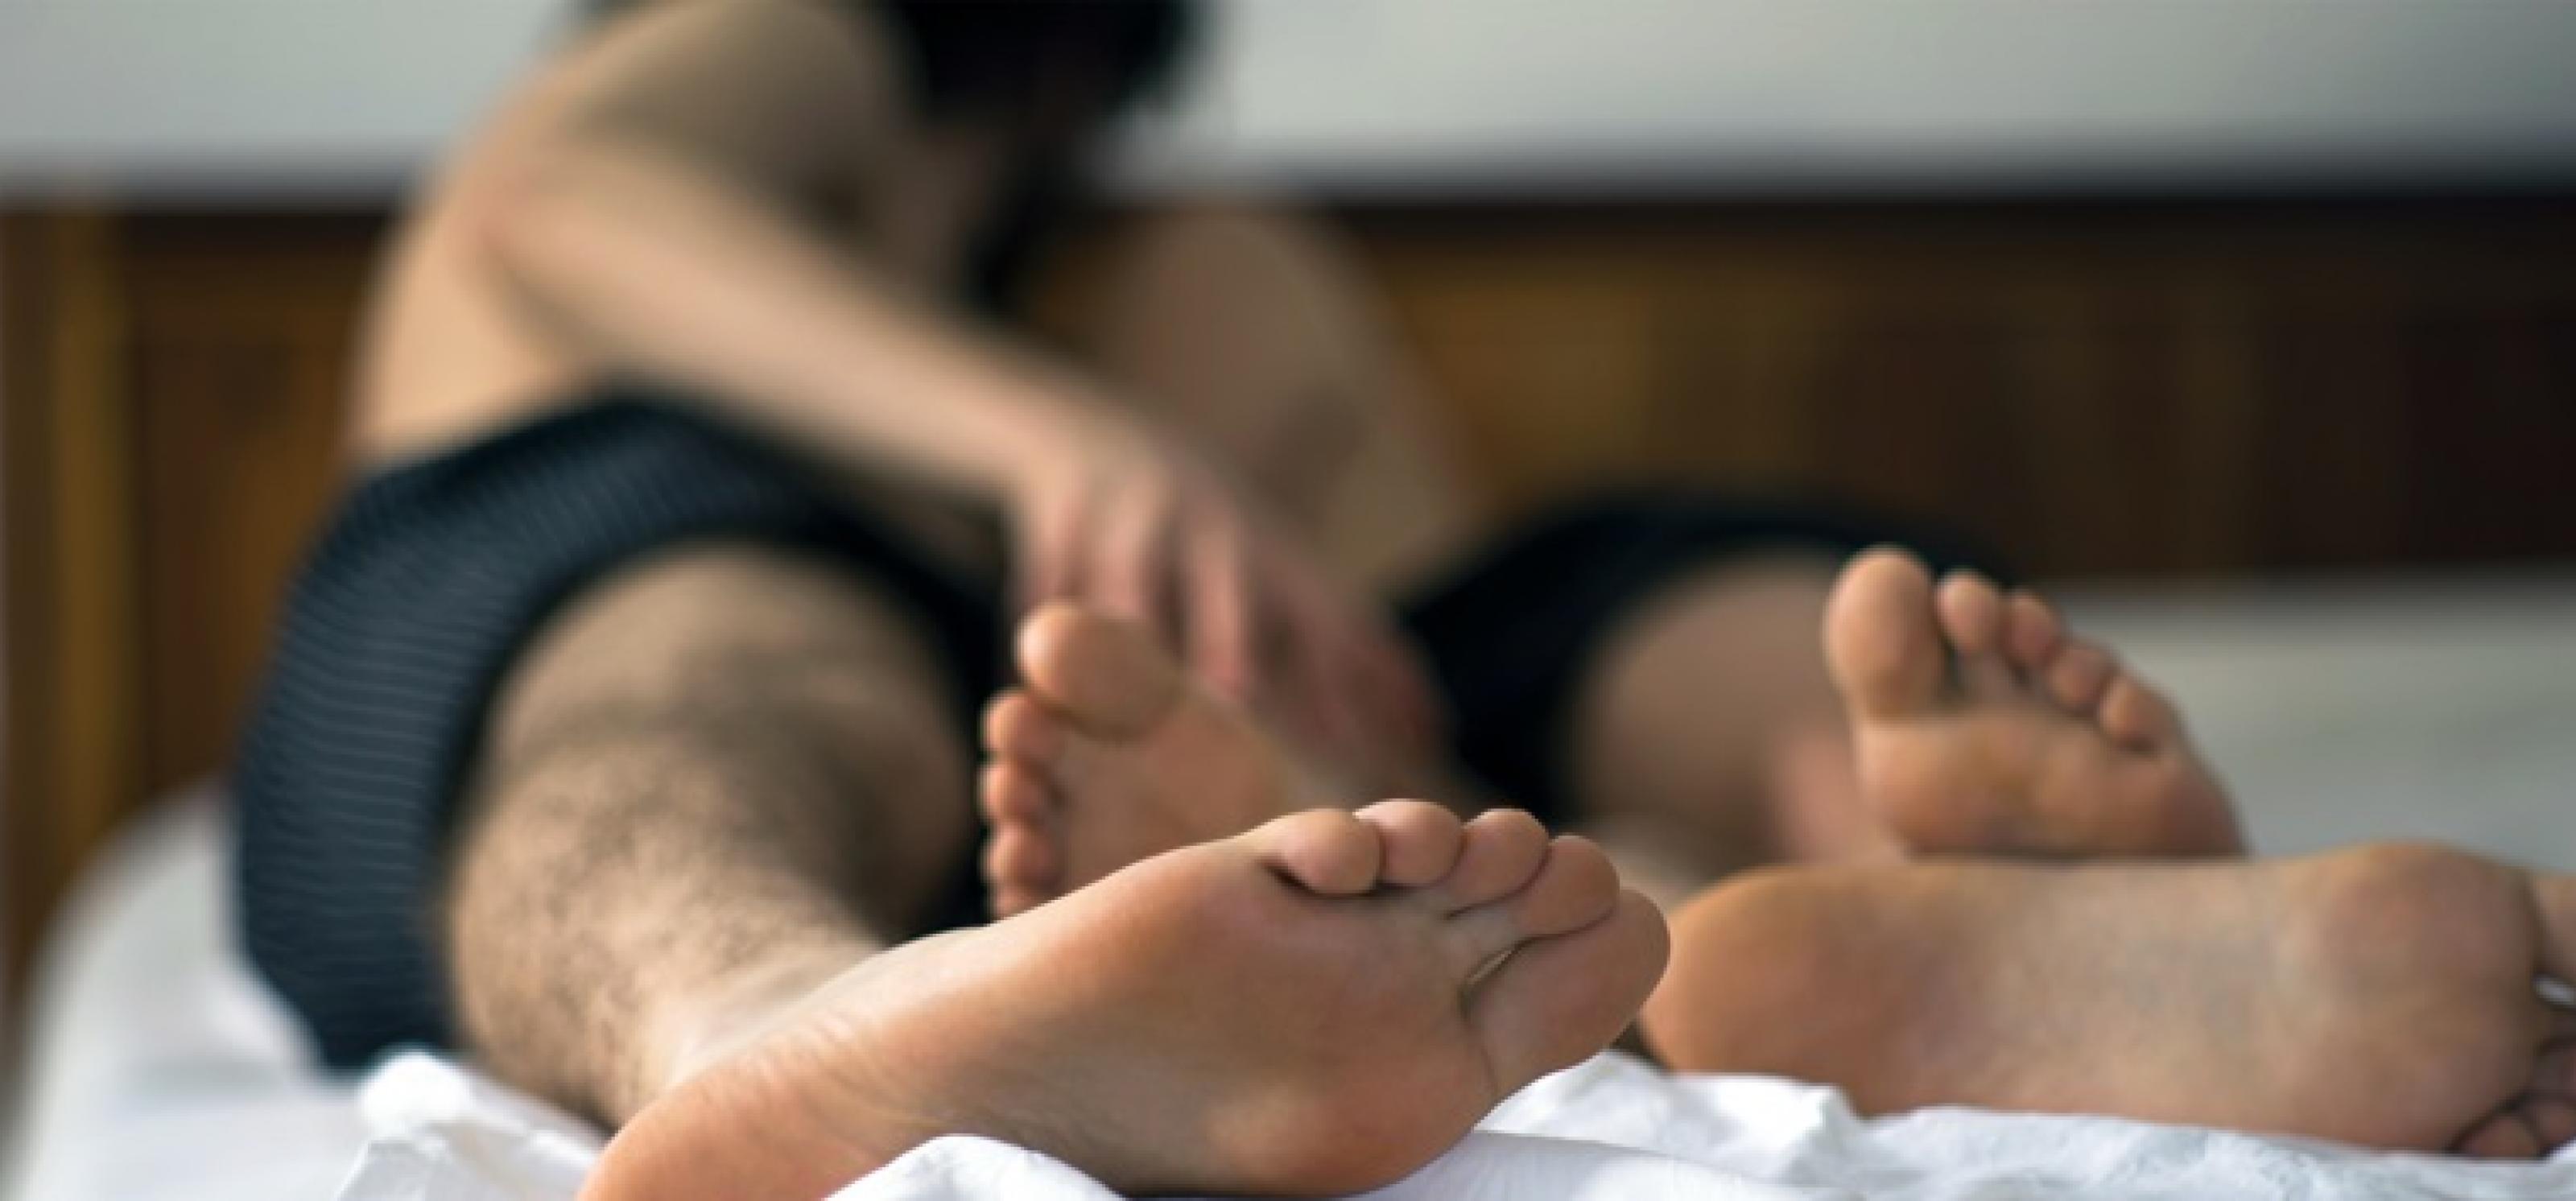 erotische massagen in duisburg sex treff wuppertal